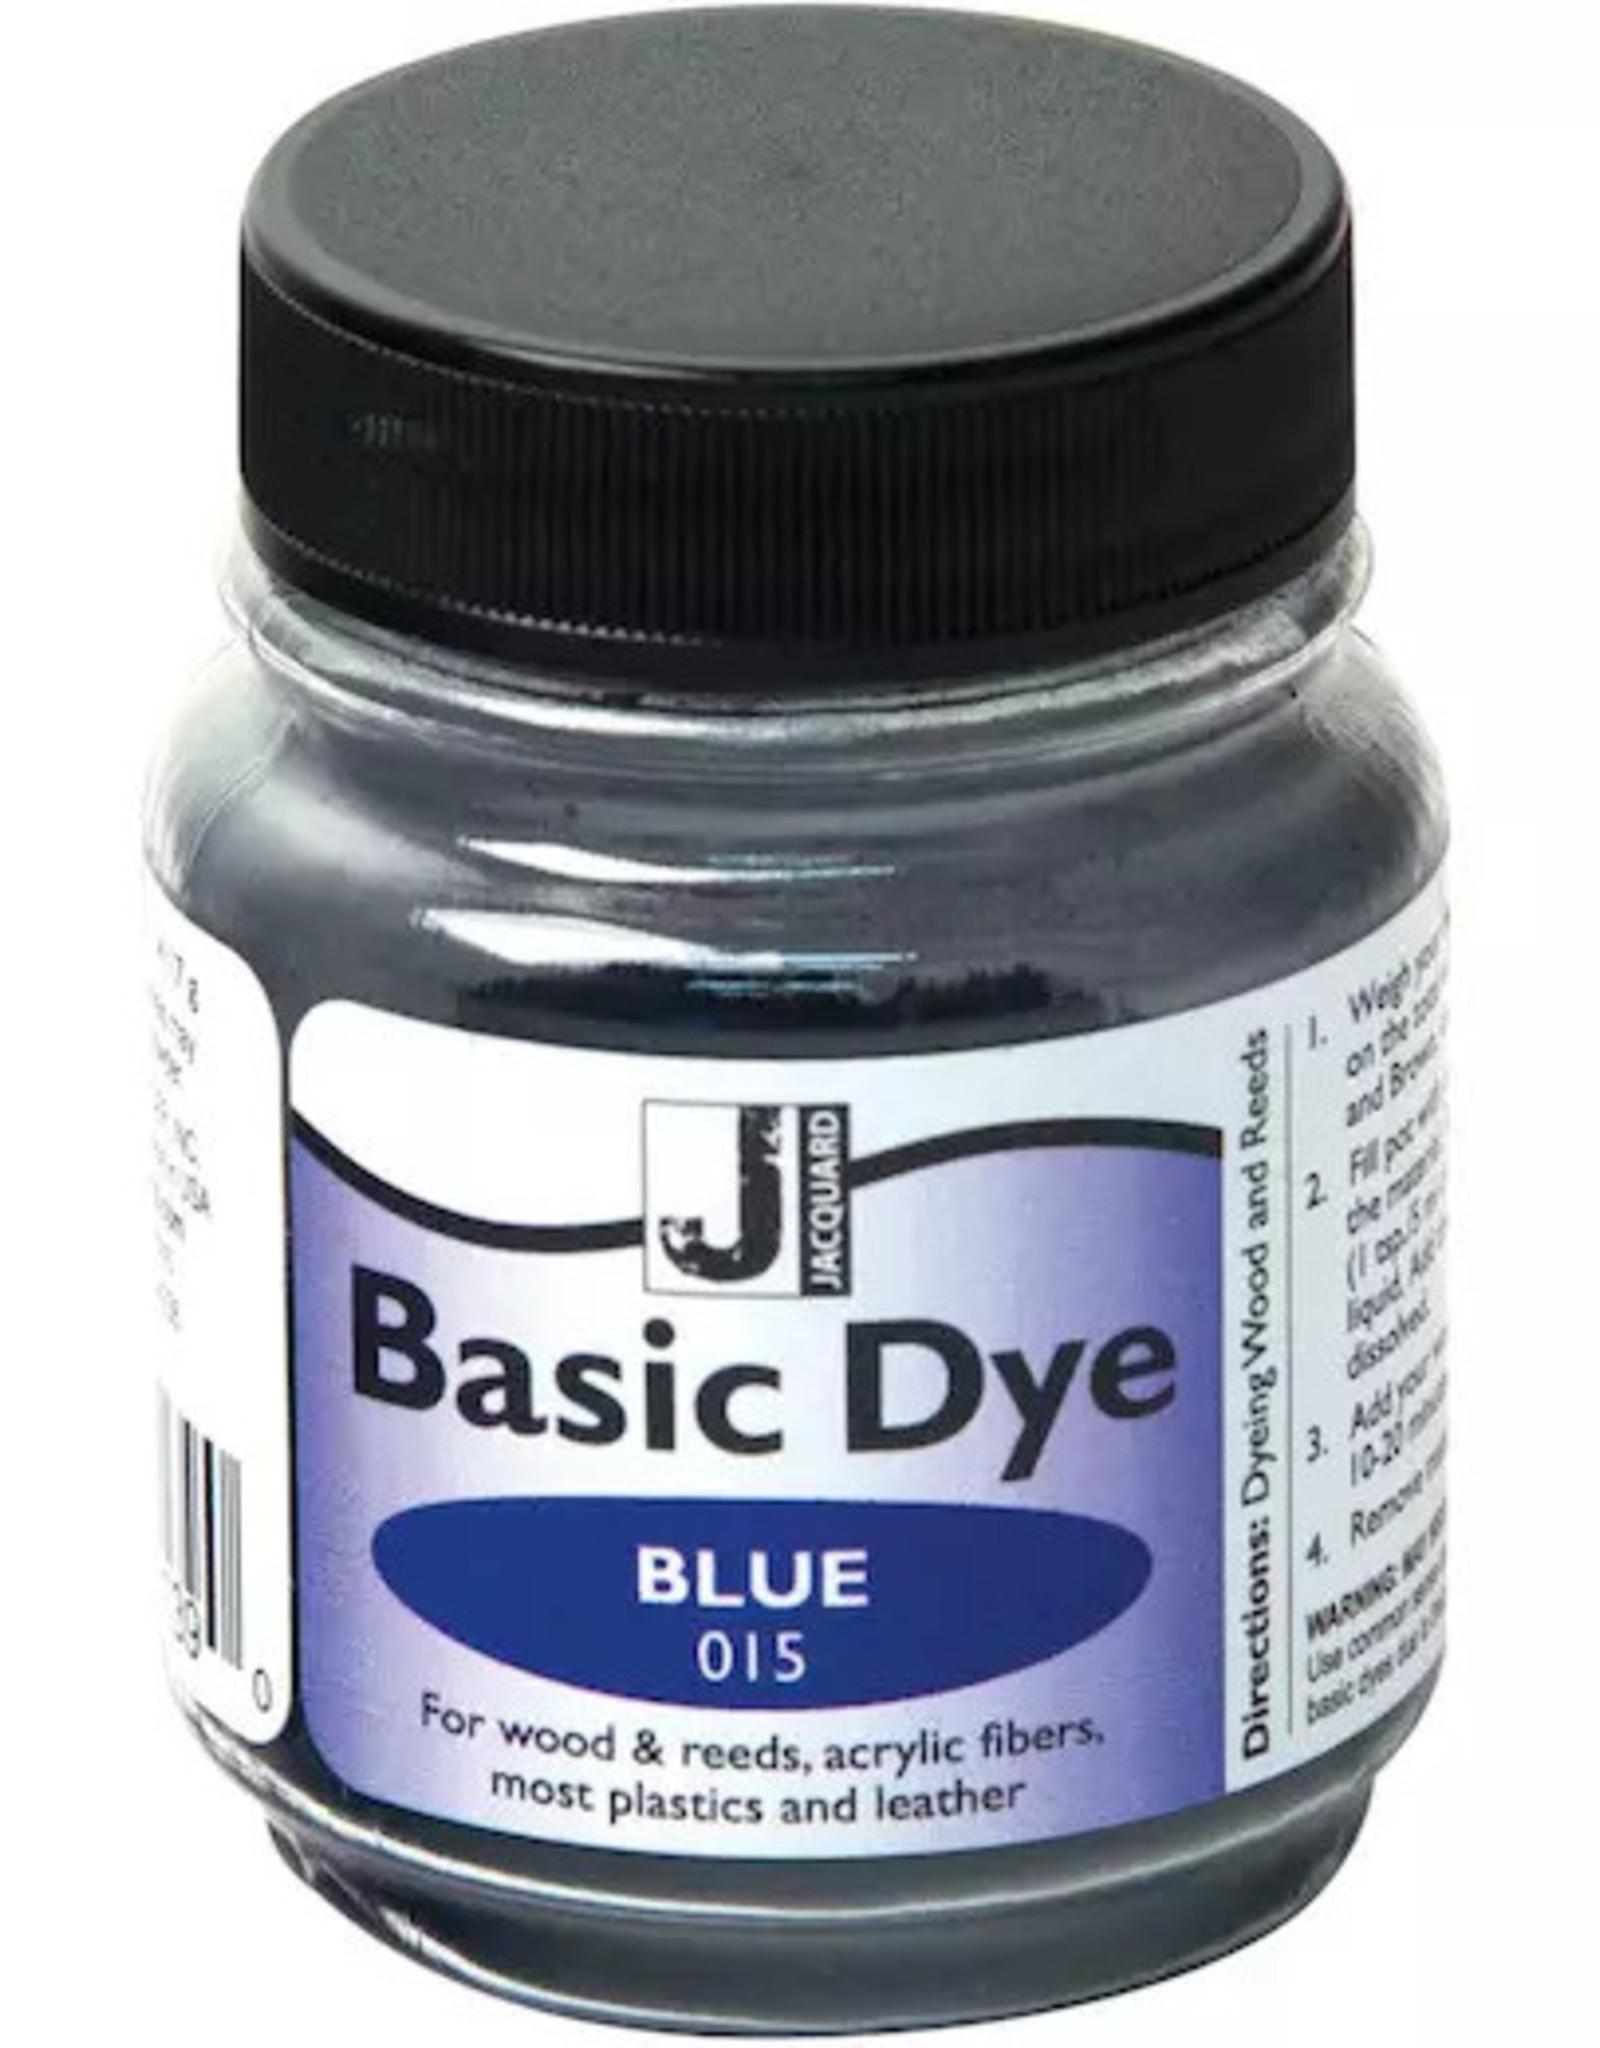 Jacquard Jacquard Basic Dye Blue